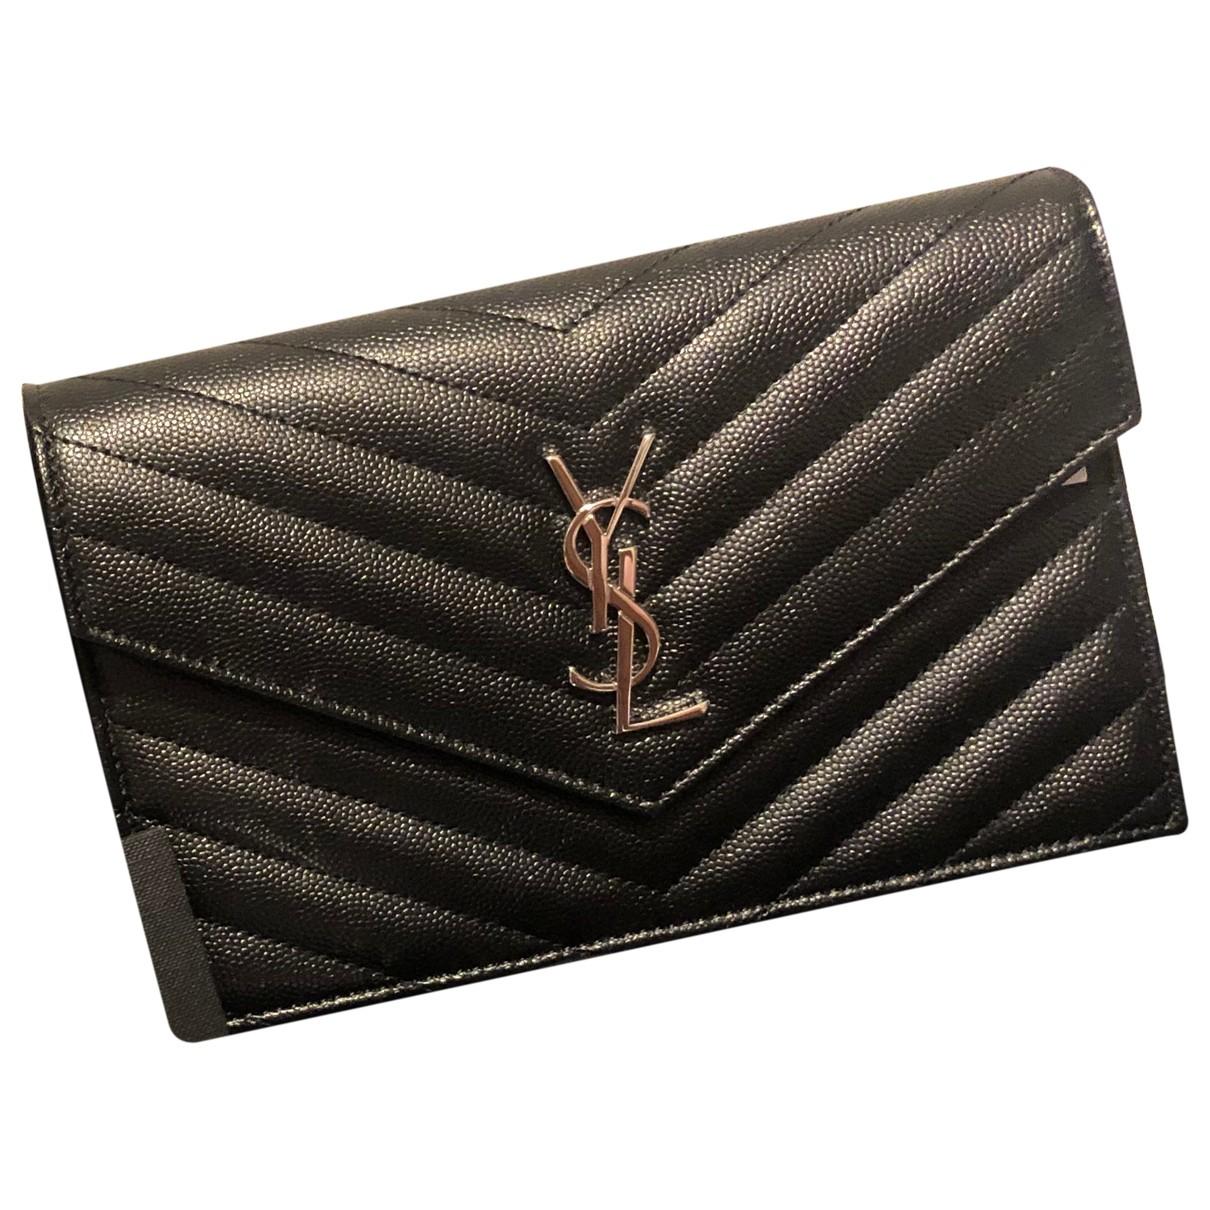 Saint Laurent Portefeuille enveloppe monogram Black Leather handbag for Women \N